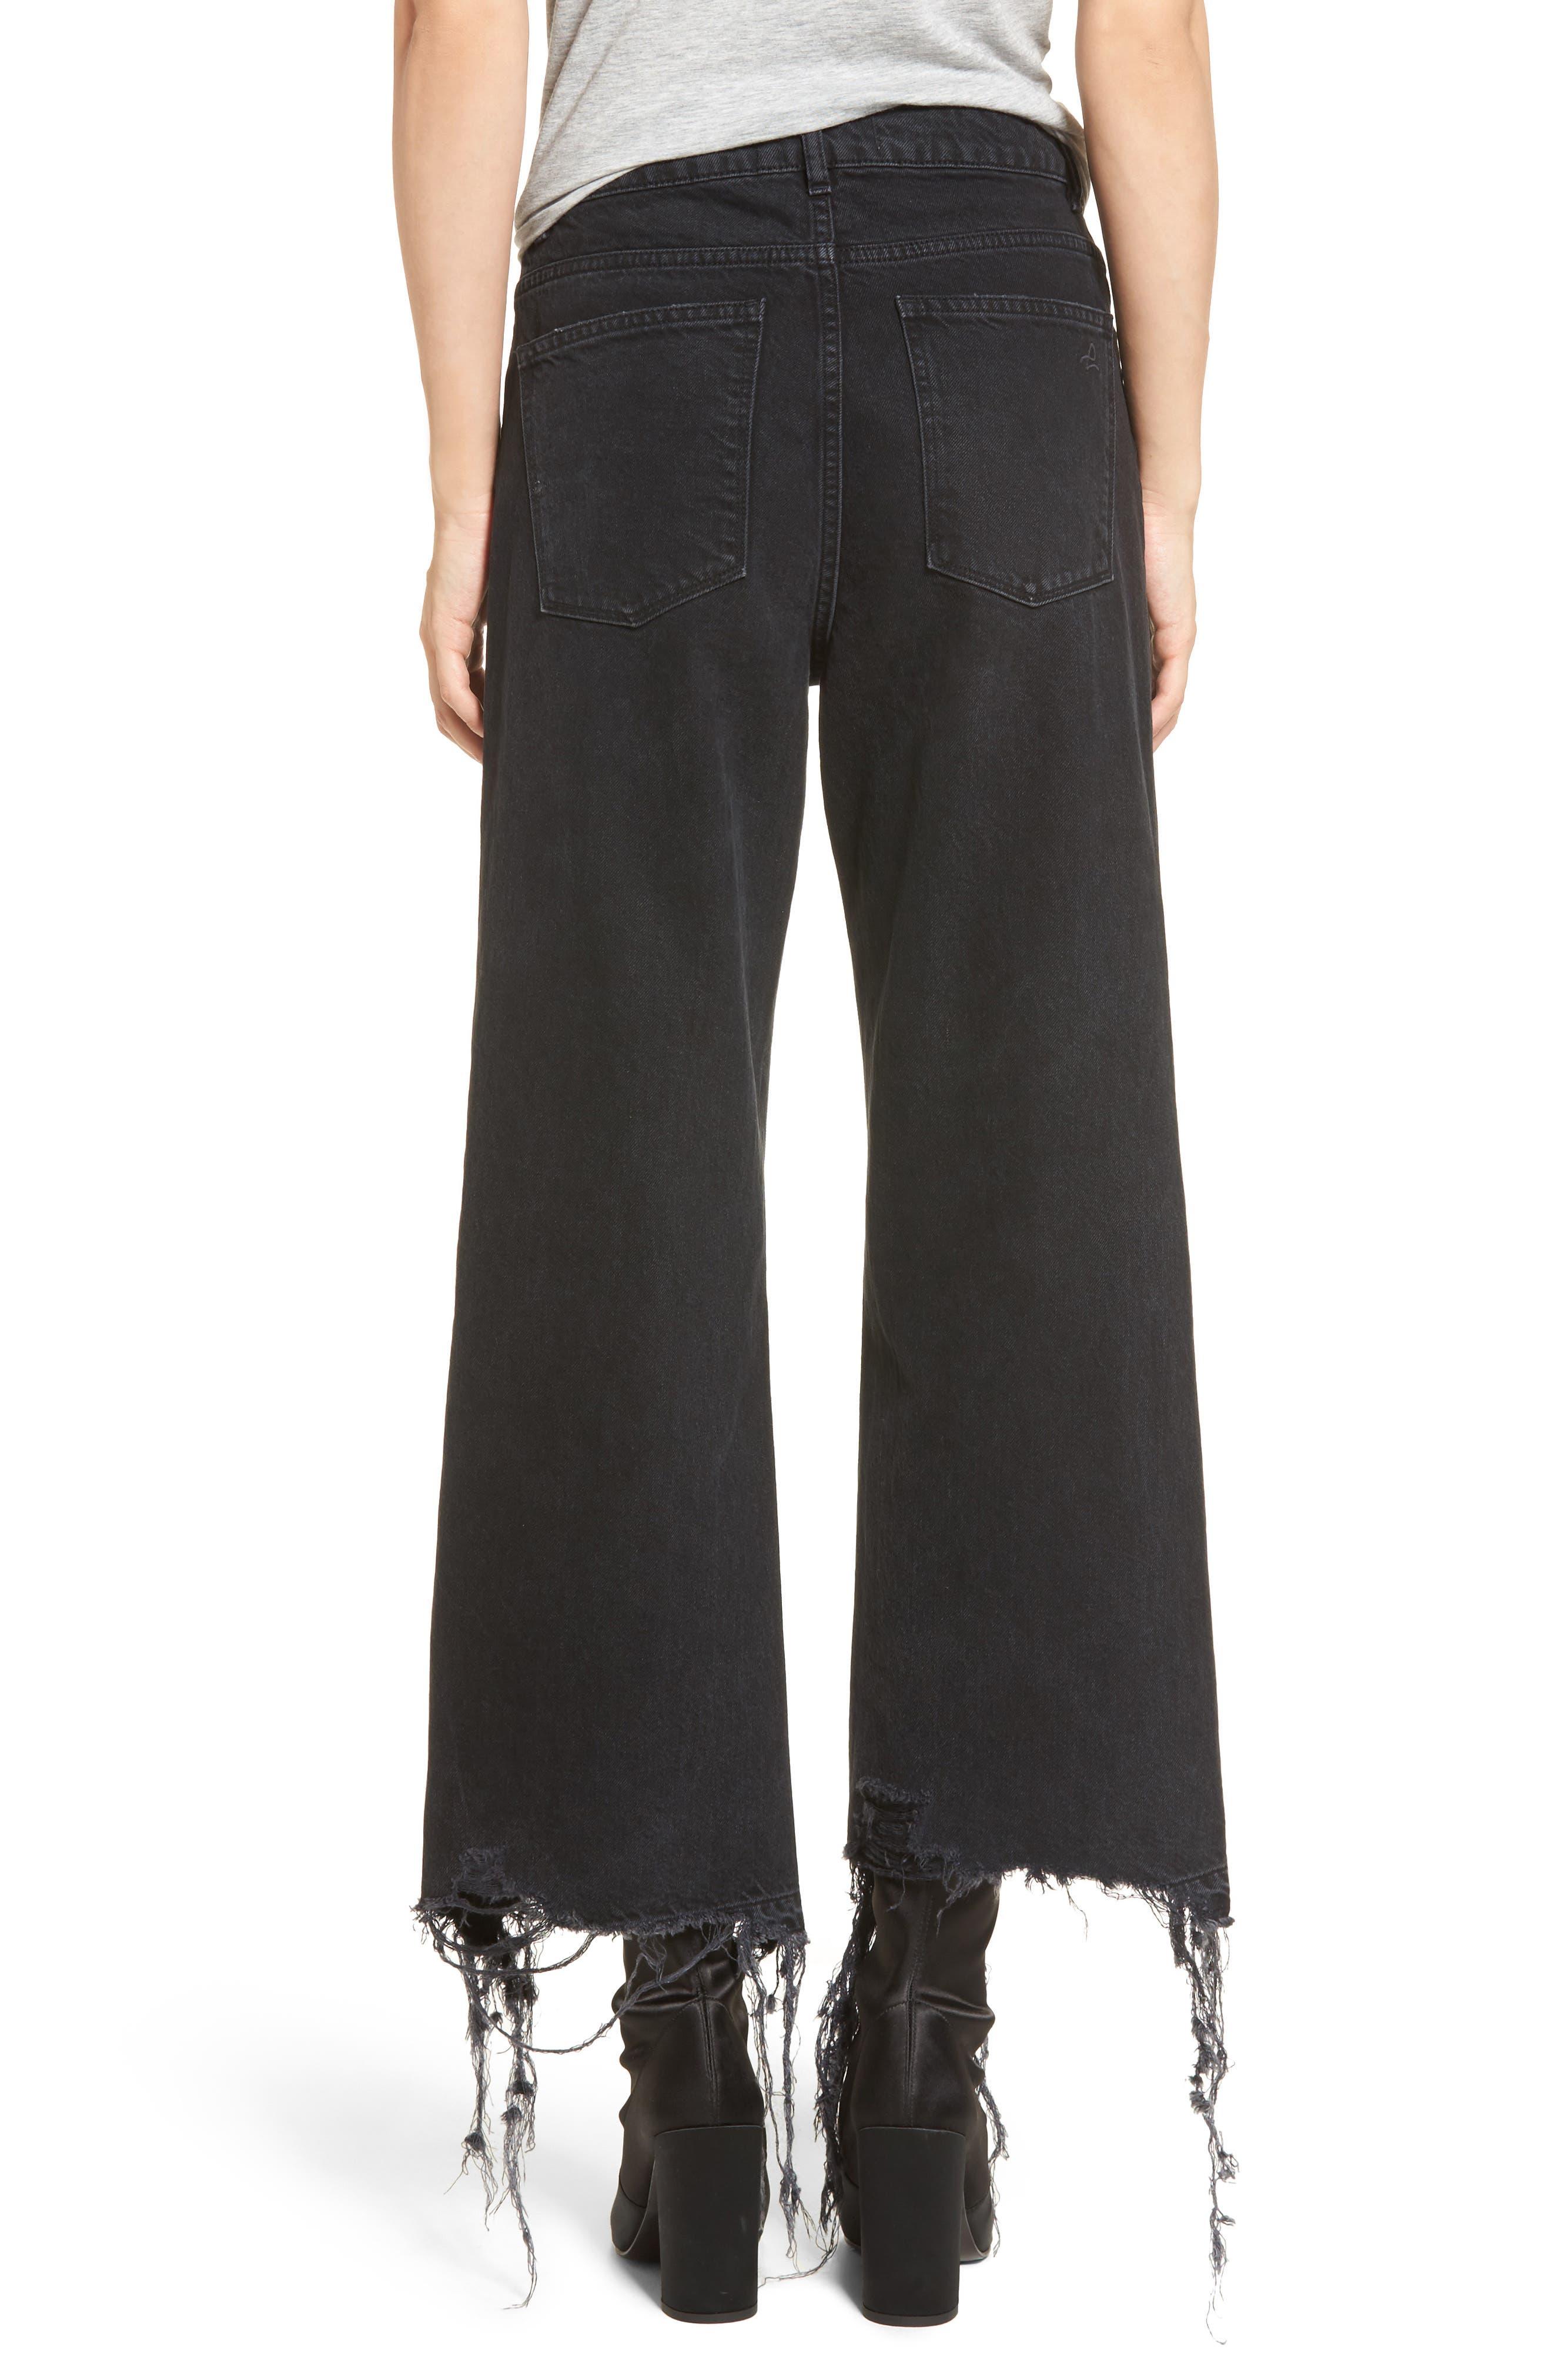 Hepburn High Waist Wide Leg Jeans,                             Alternate thumbnail 2, color,                             020